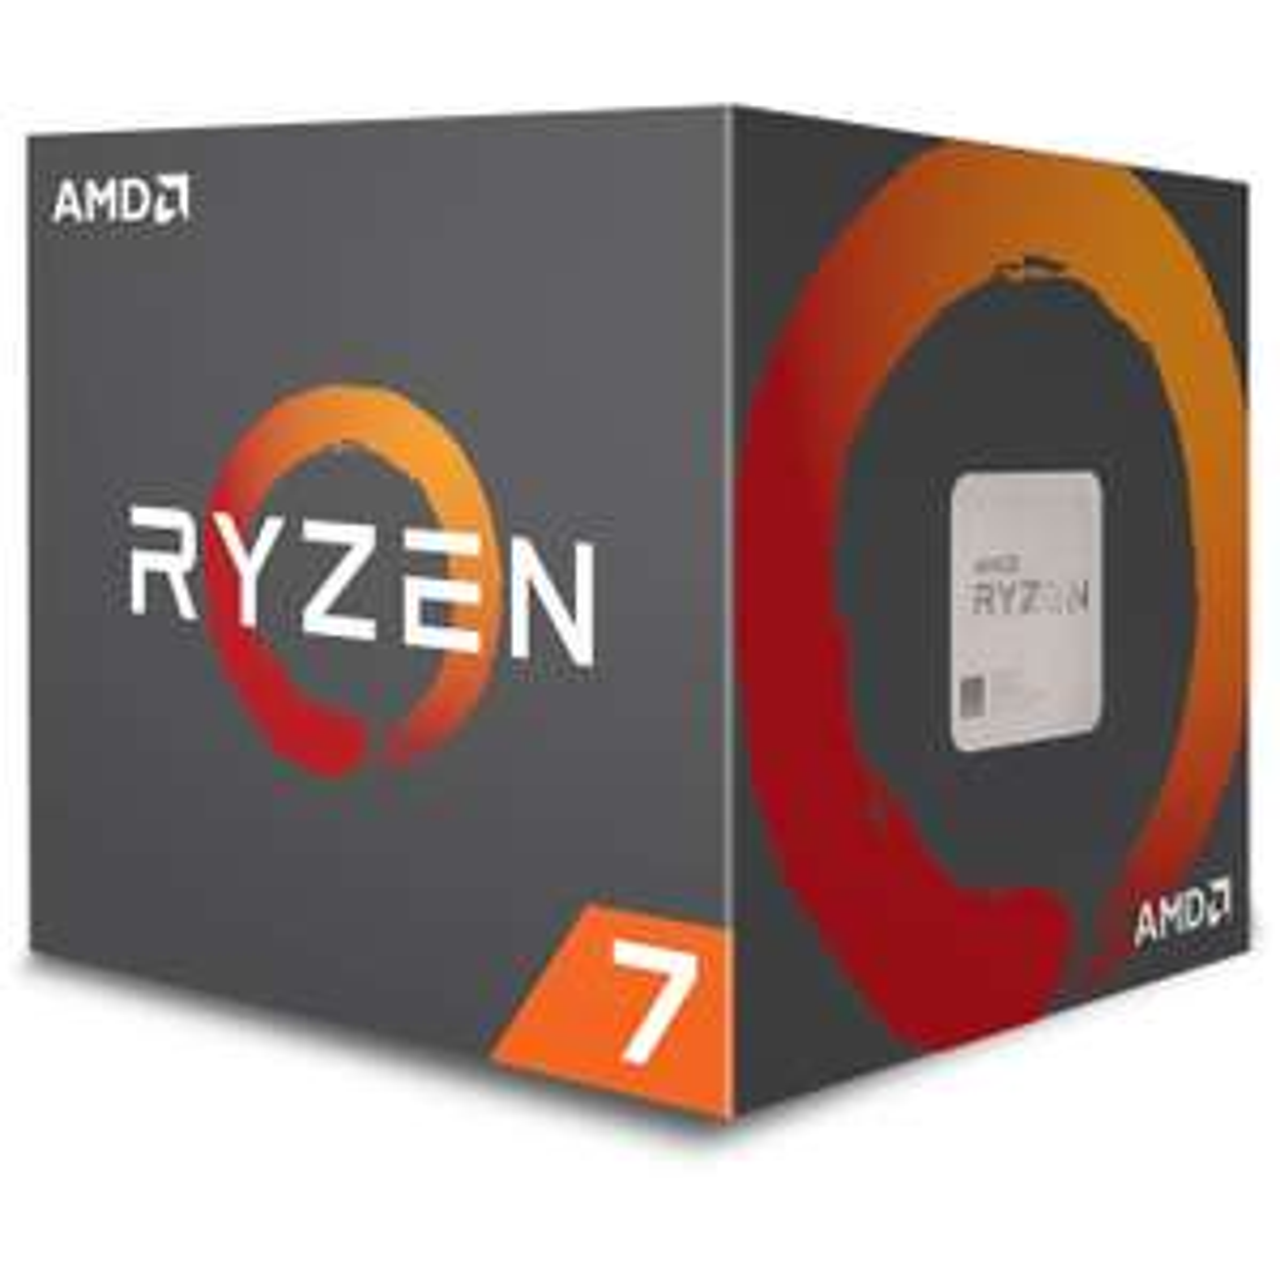 AMD Ryzen 7 2700 MIndfactory (Mindstar)